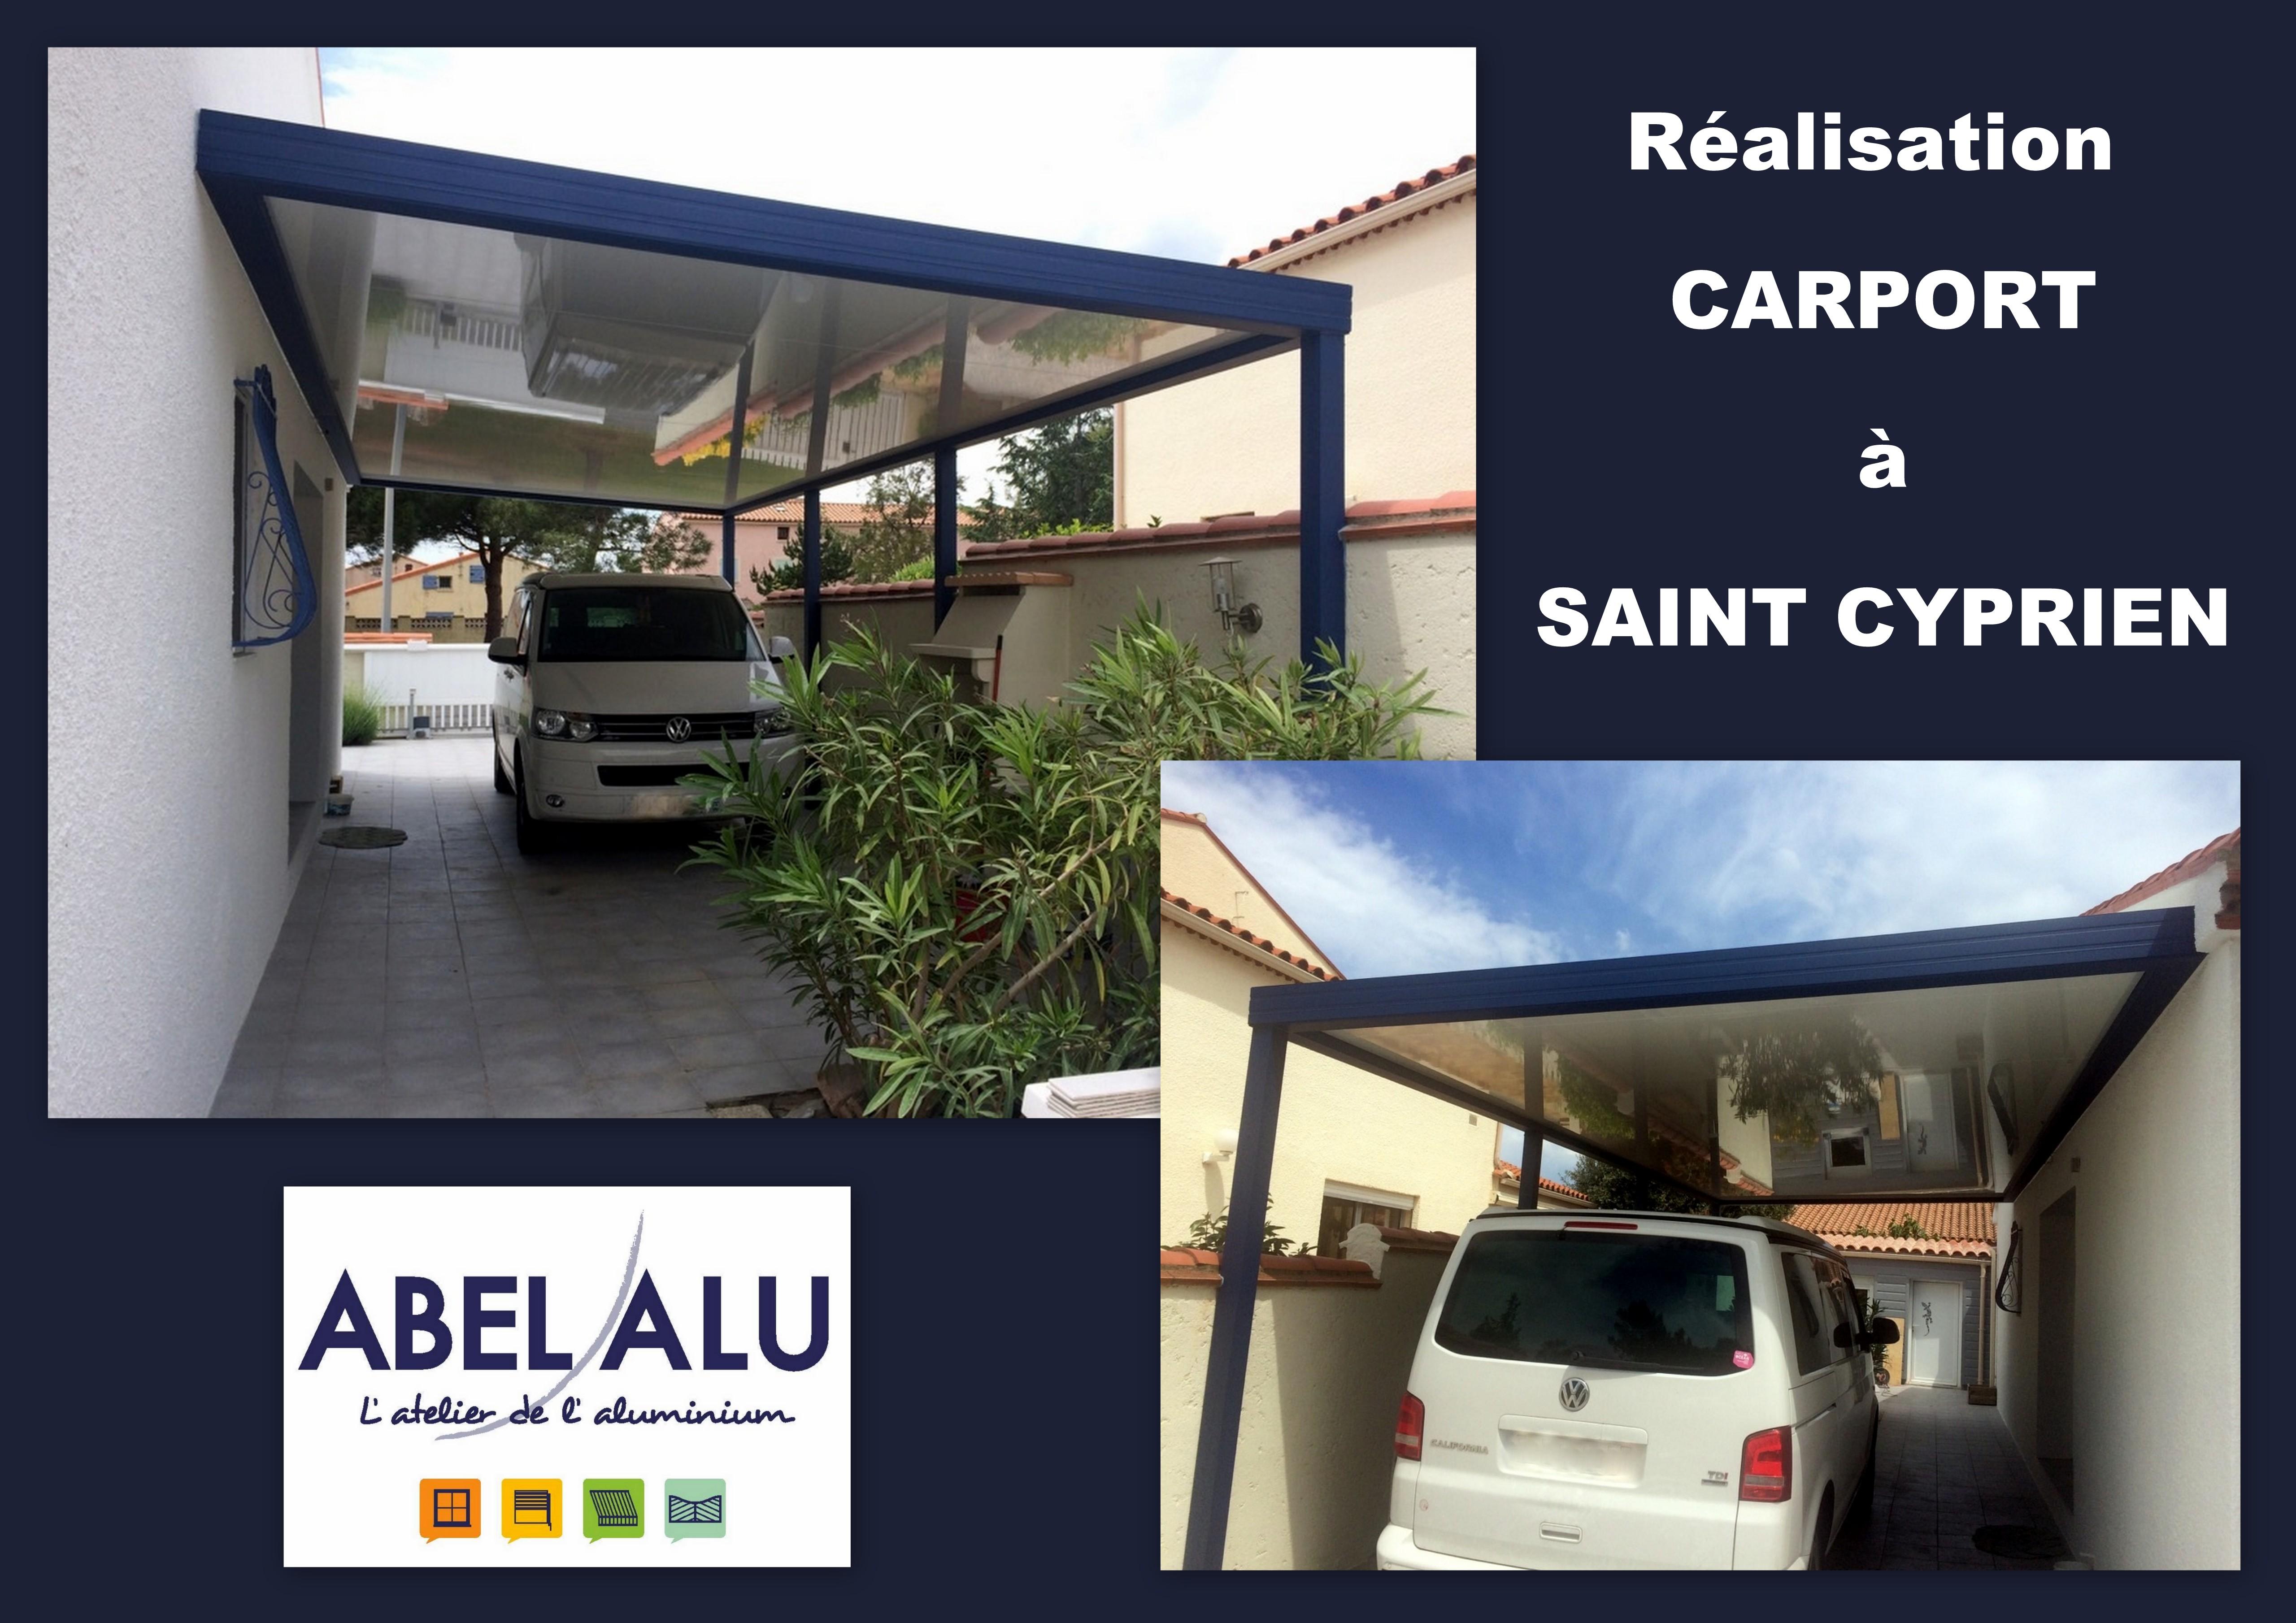 ABEL ALU - CARPORT - ST CYPRIEN